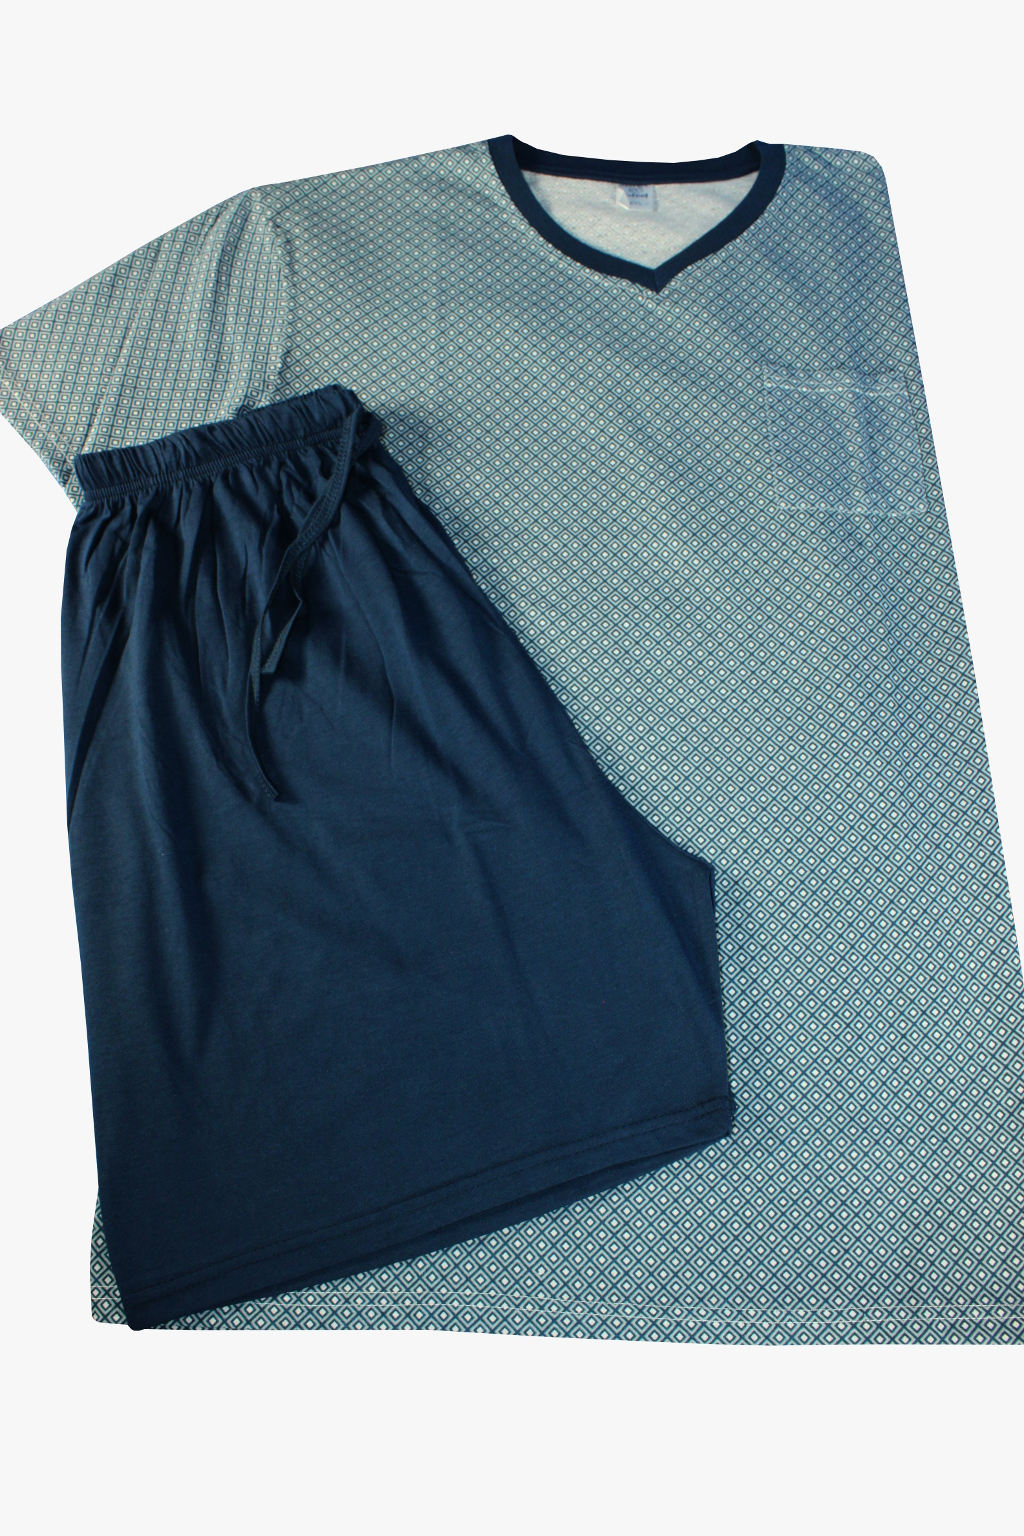 Javon pánské pyžamo XXL modrá